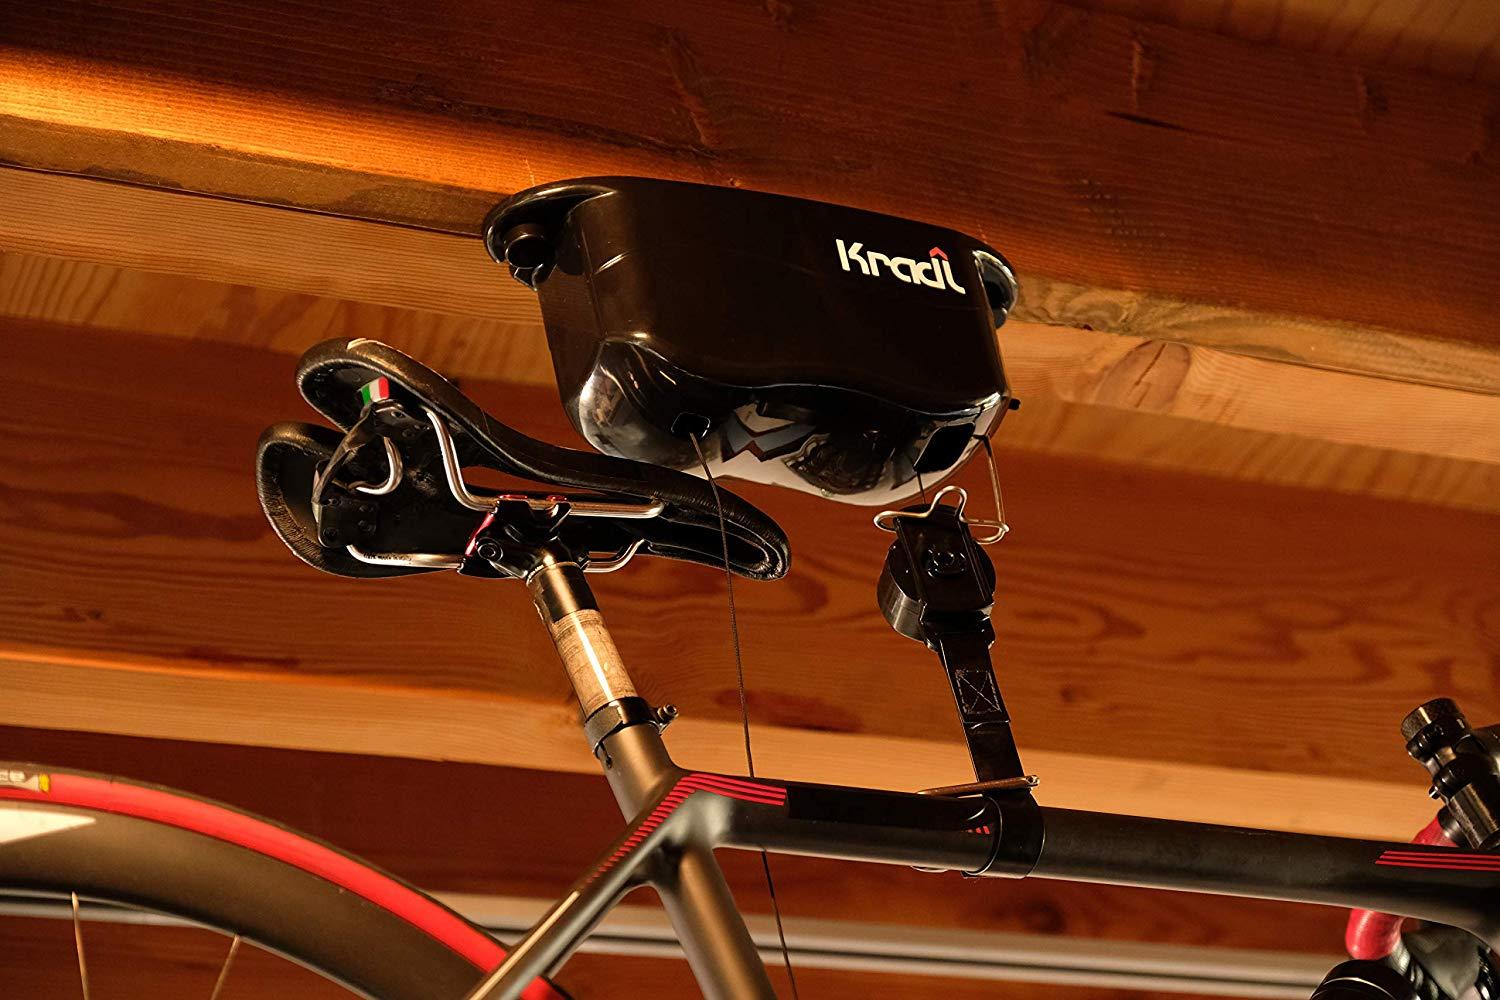 Kradl – Ceiling Mount Bike Rack